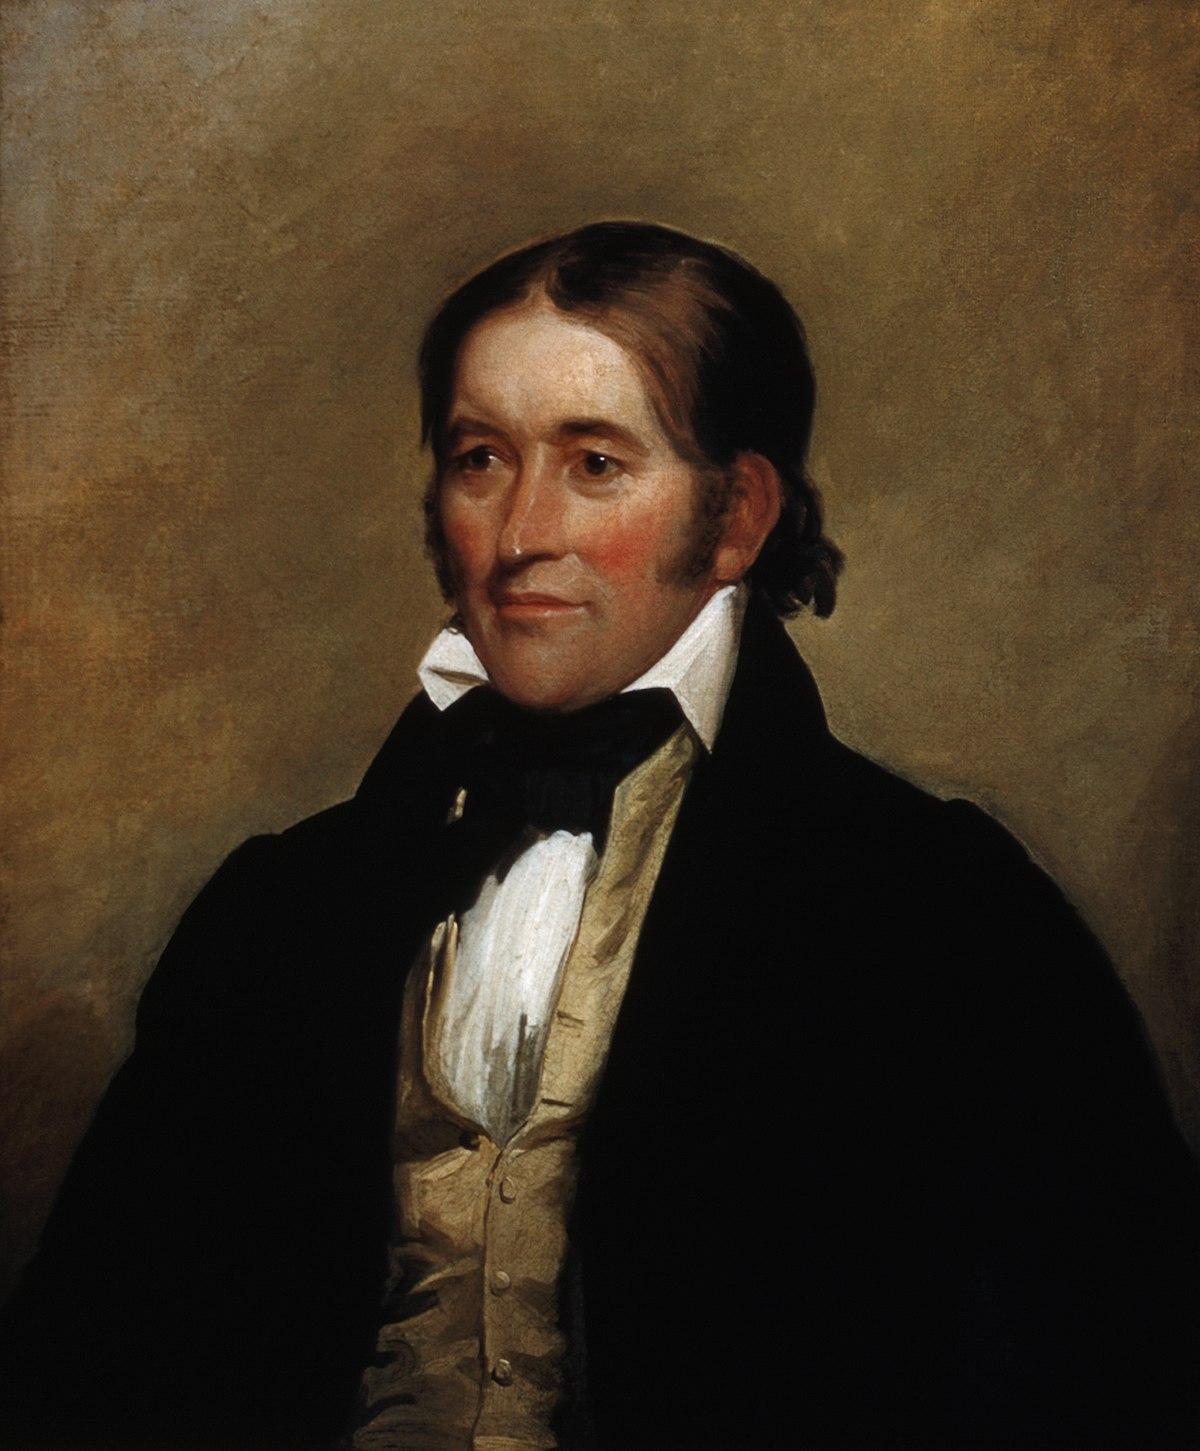 Davy Crockett - Wikipedia